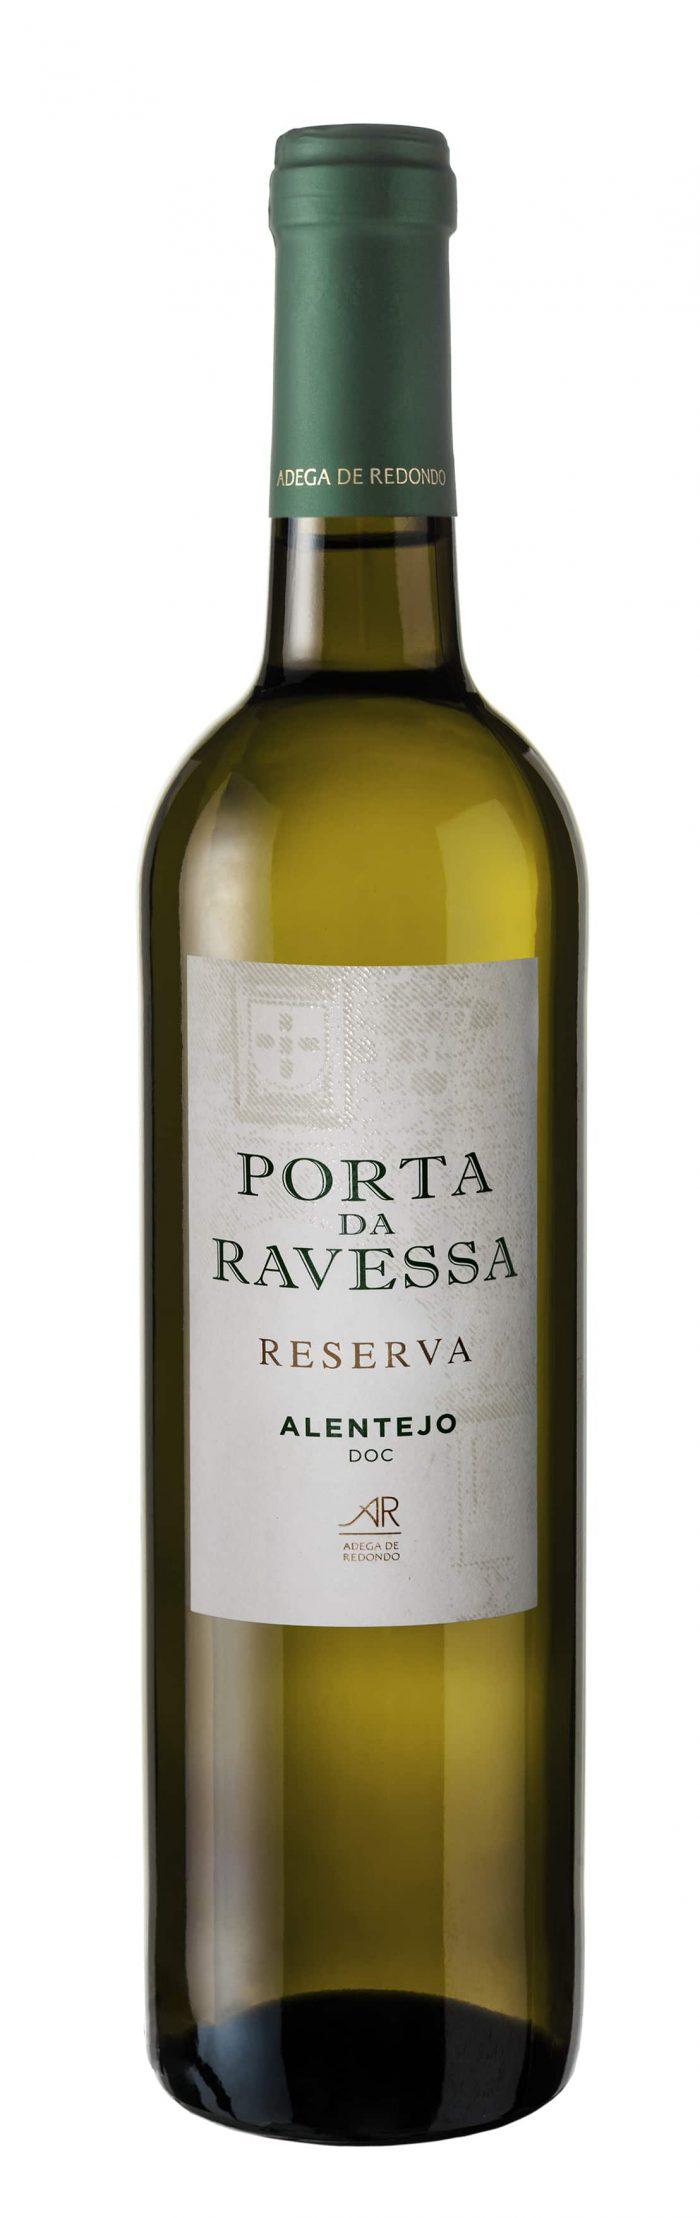 Porta da Ravessa Reserva Blanco | Portugal | gemaakt van de druif: Arinto, Fernão Pires, Semillon